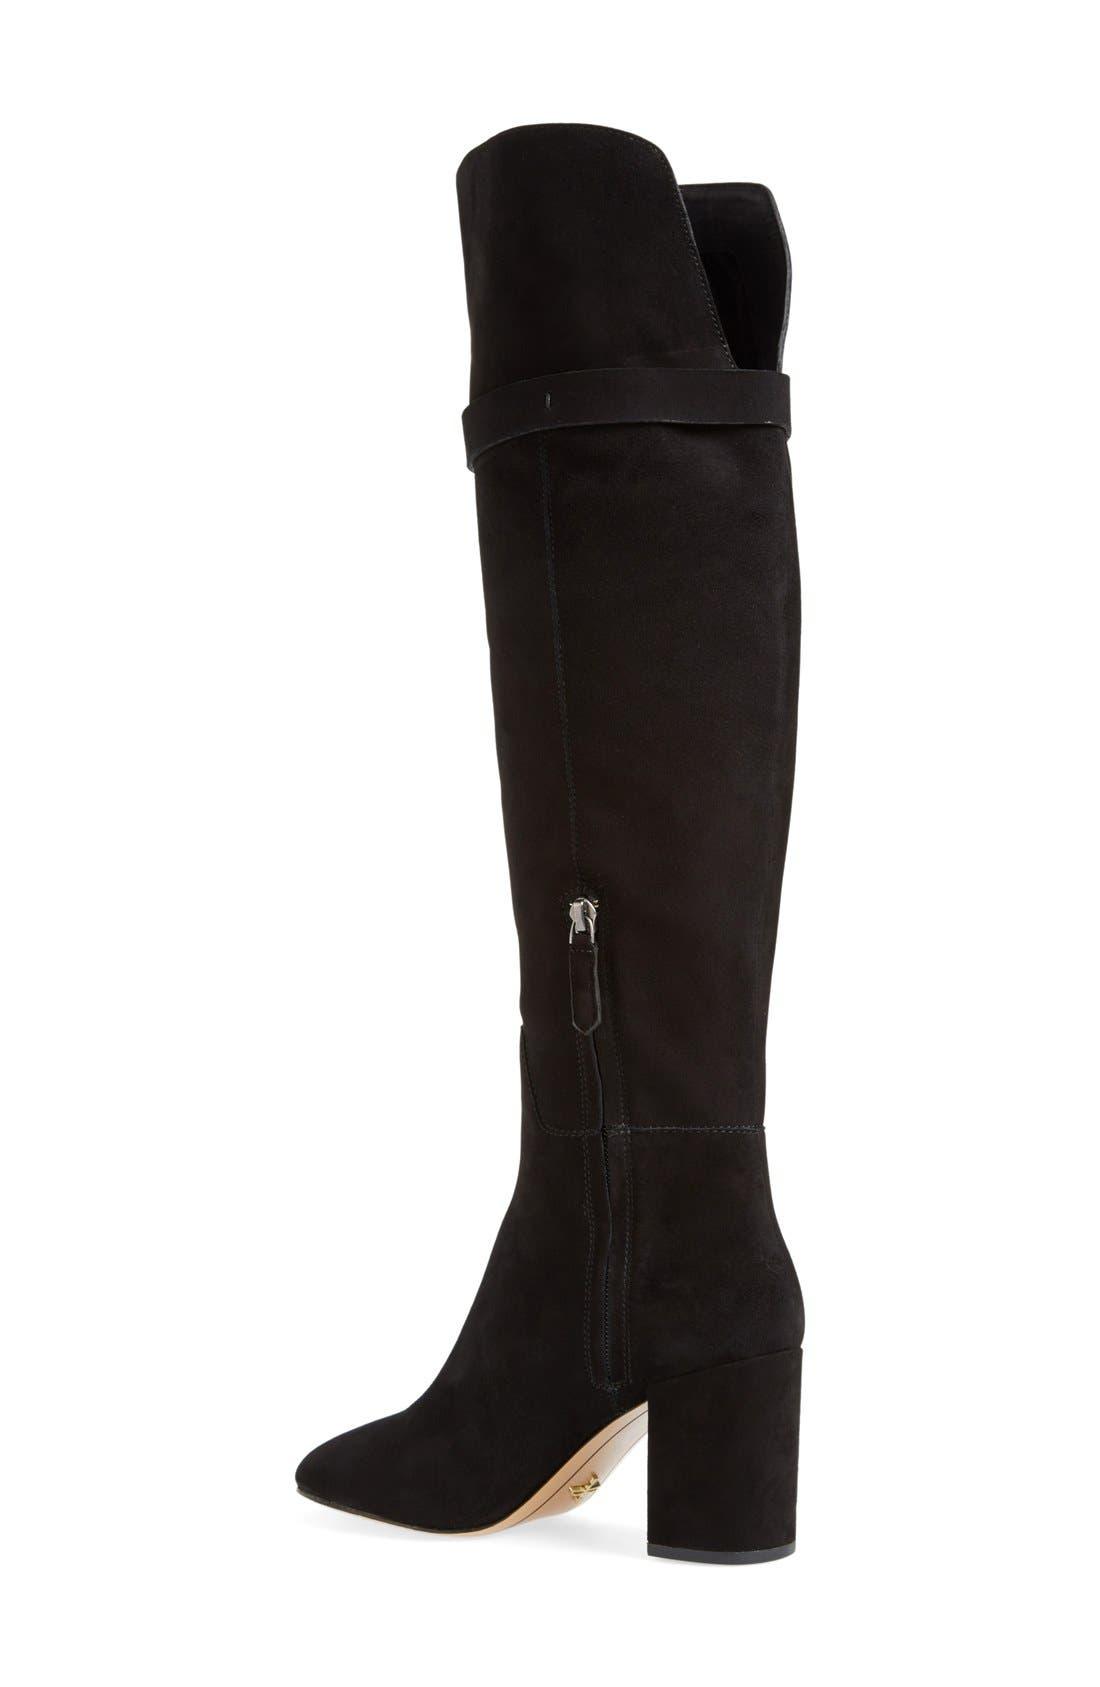 Alternate Image 2  - Pour la Victoire'Dania' Over the Knee Boot (Women)